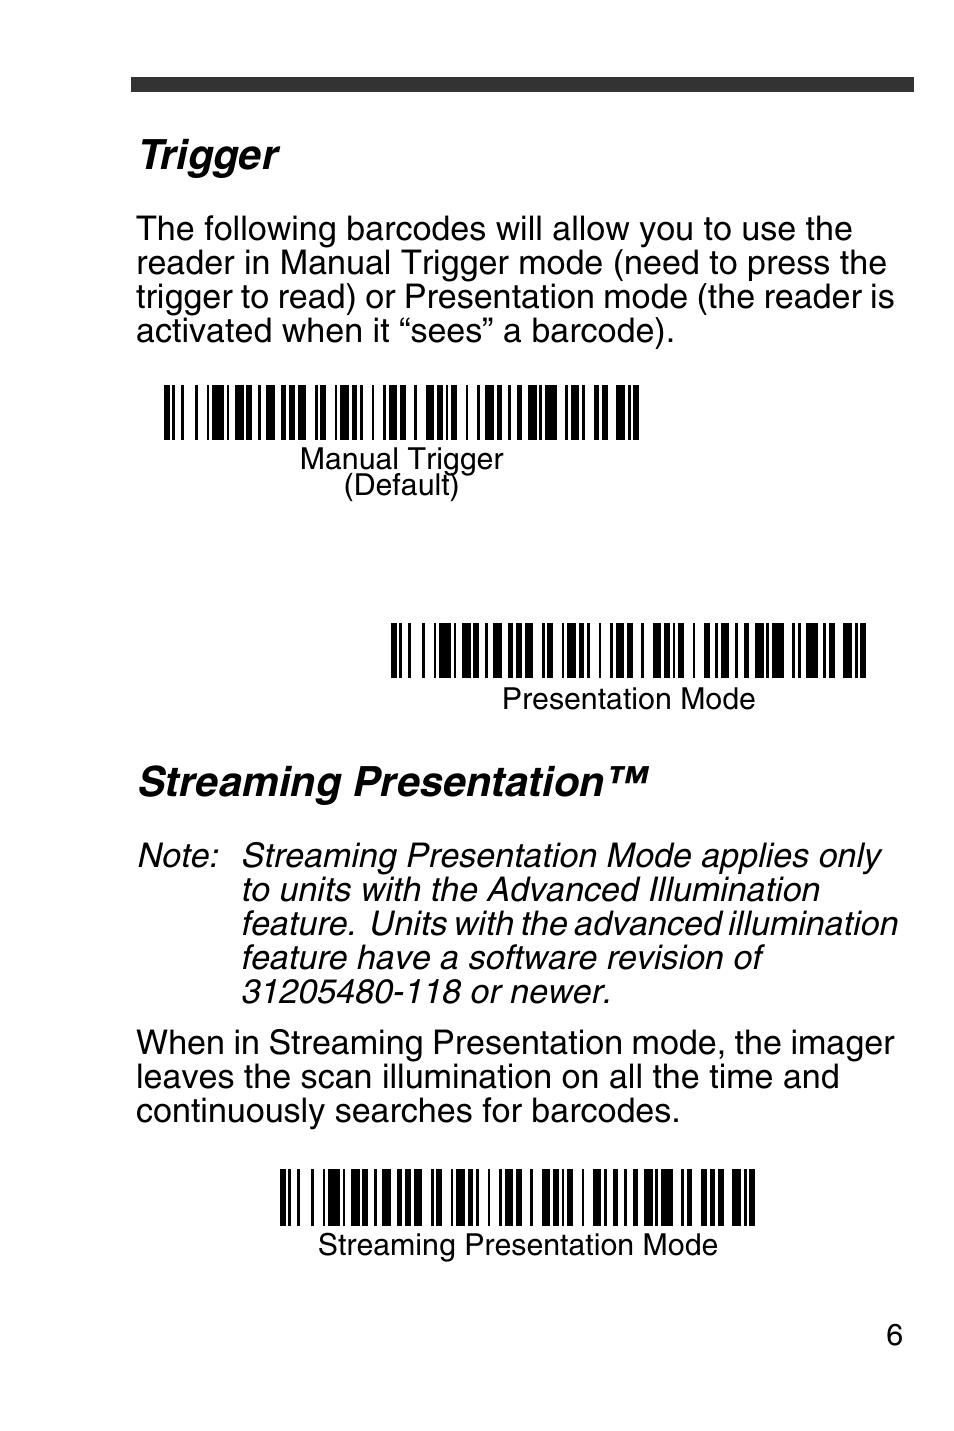 trigger streaming presentation honeywell 4600g user manual page rh manualsdir com Honeywell 4600G Driver Windows 7 honeywell 4600g scanner user manual